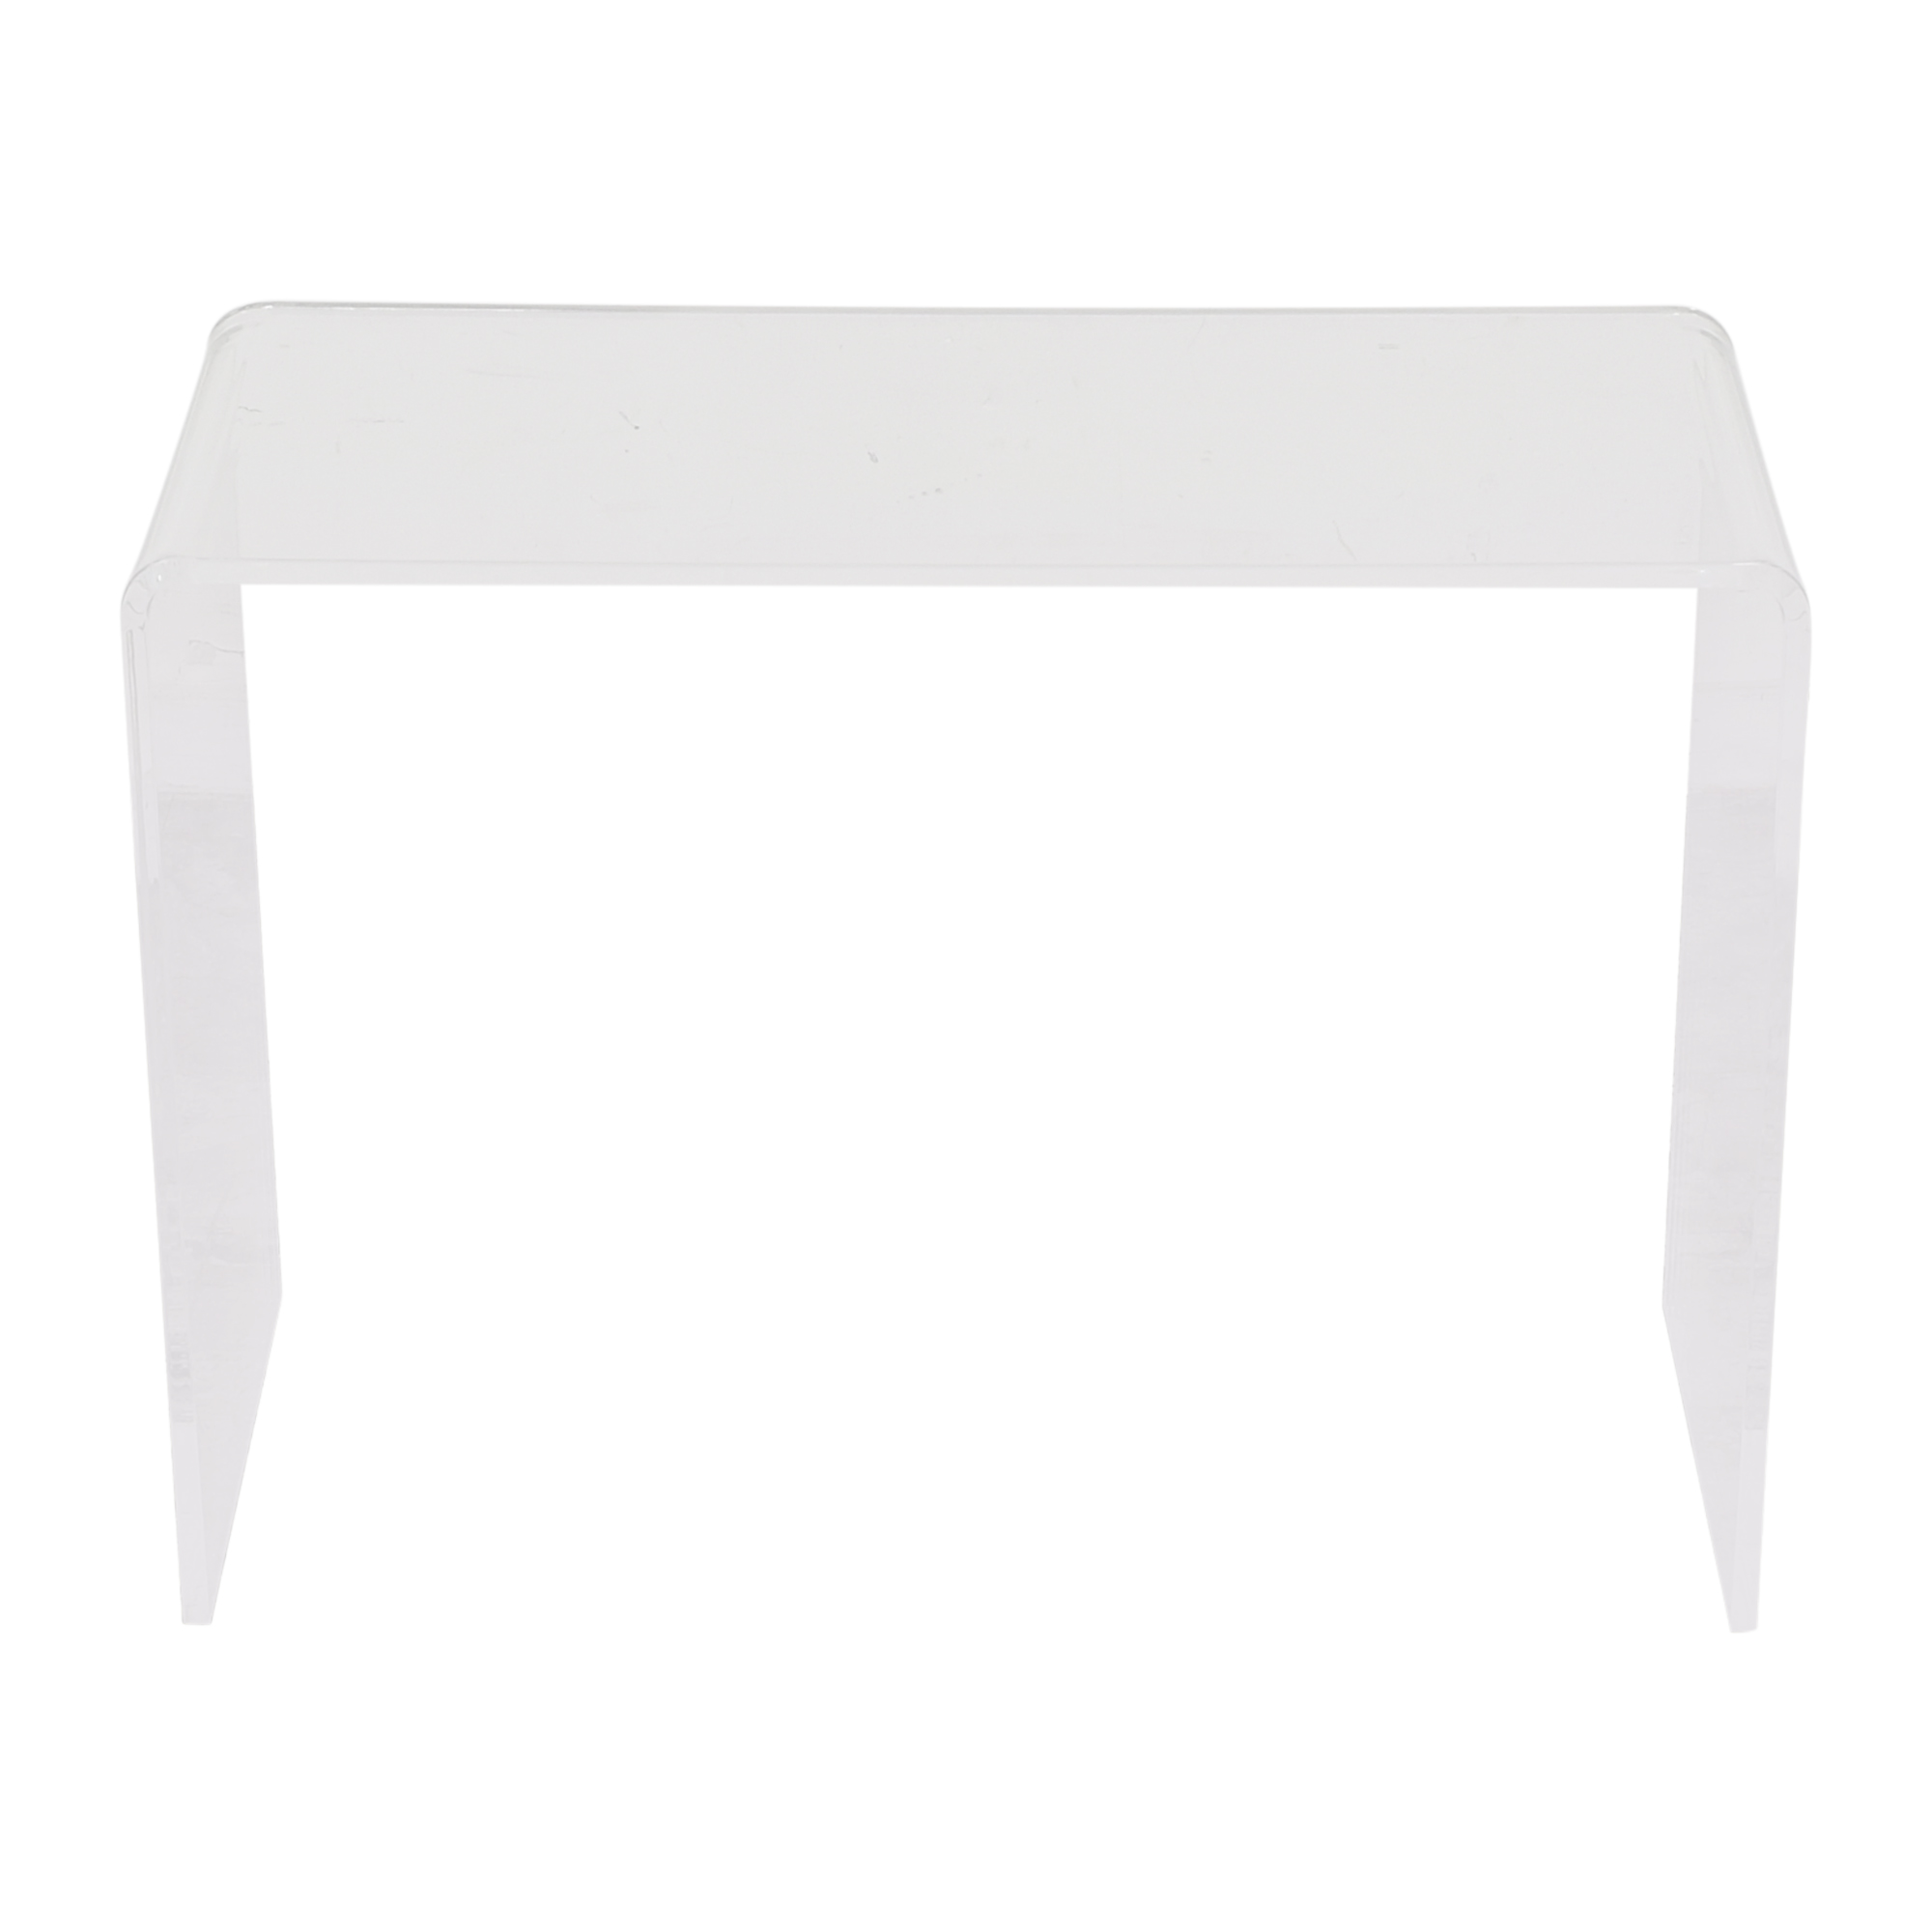 CB2 CB2 Peekaboo Acrylic Console Table clear